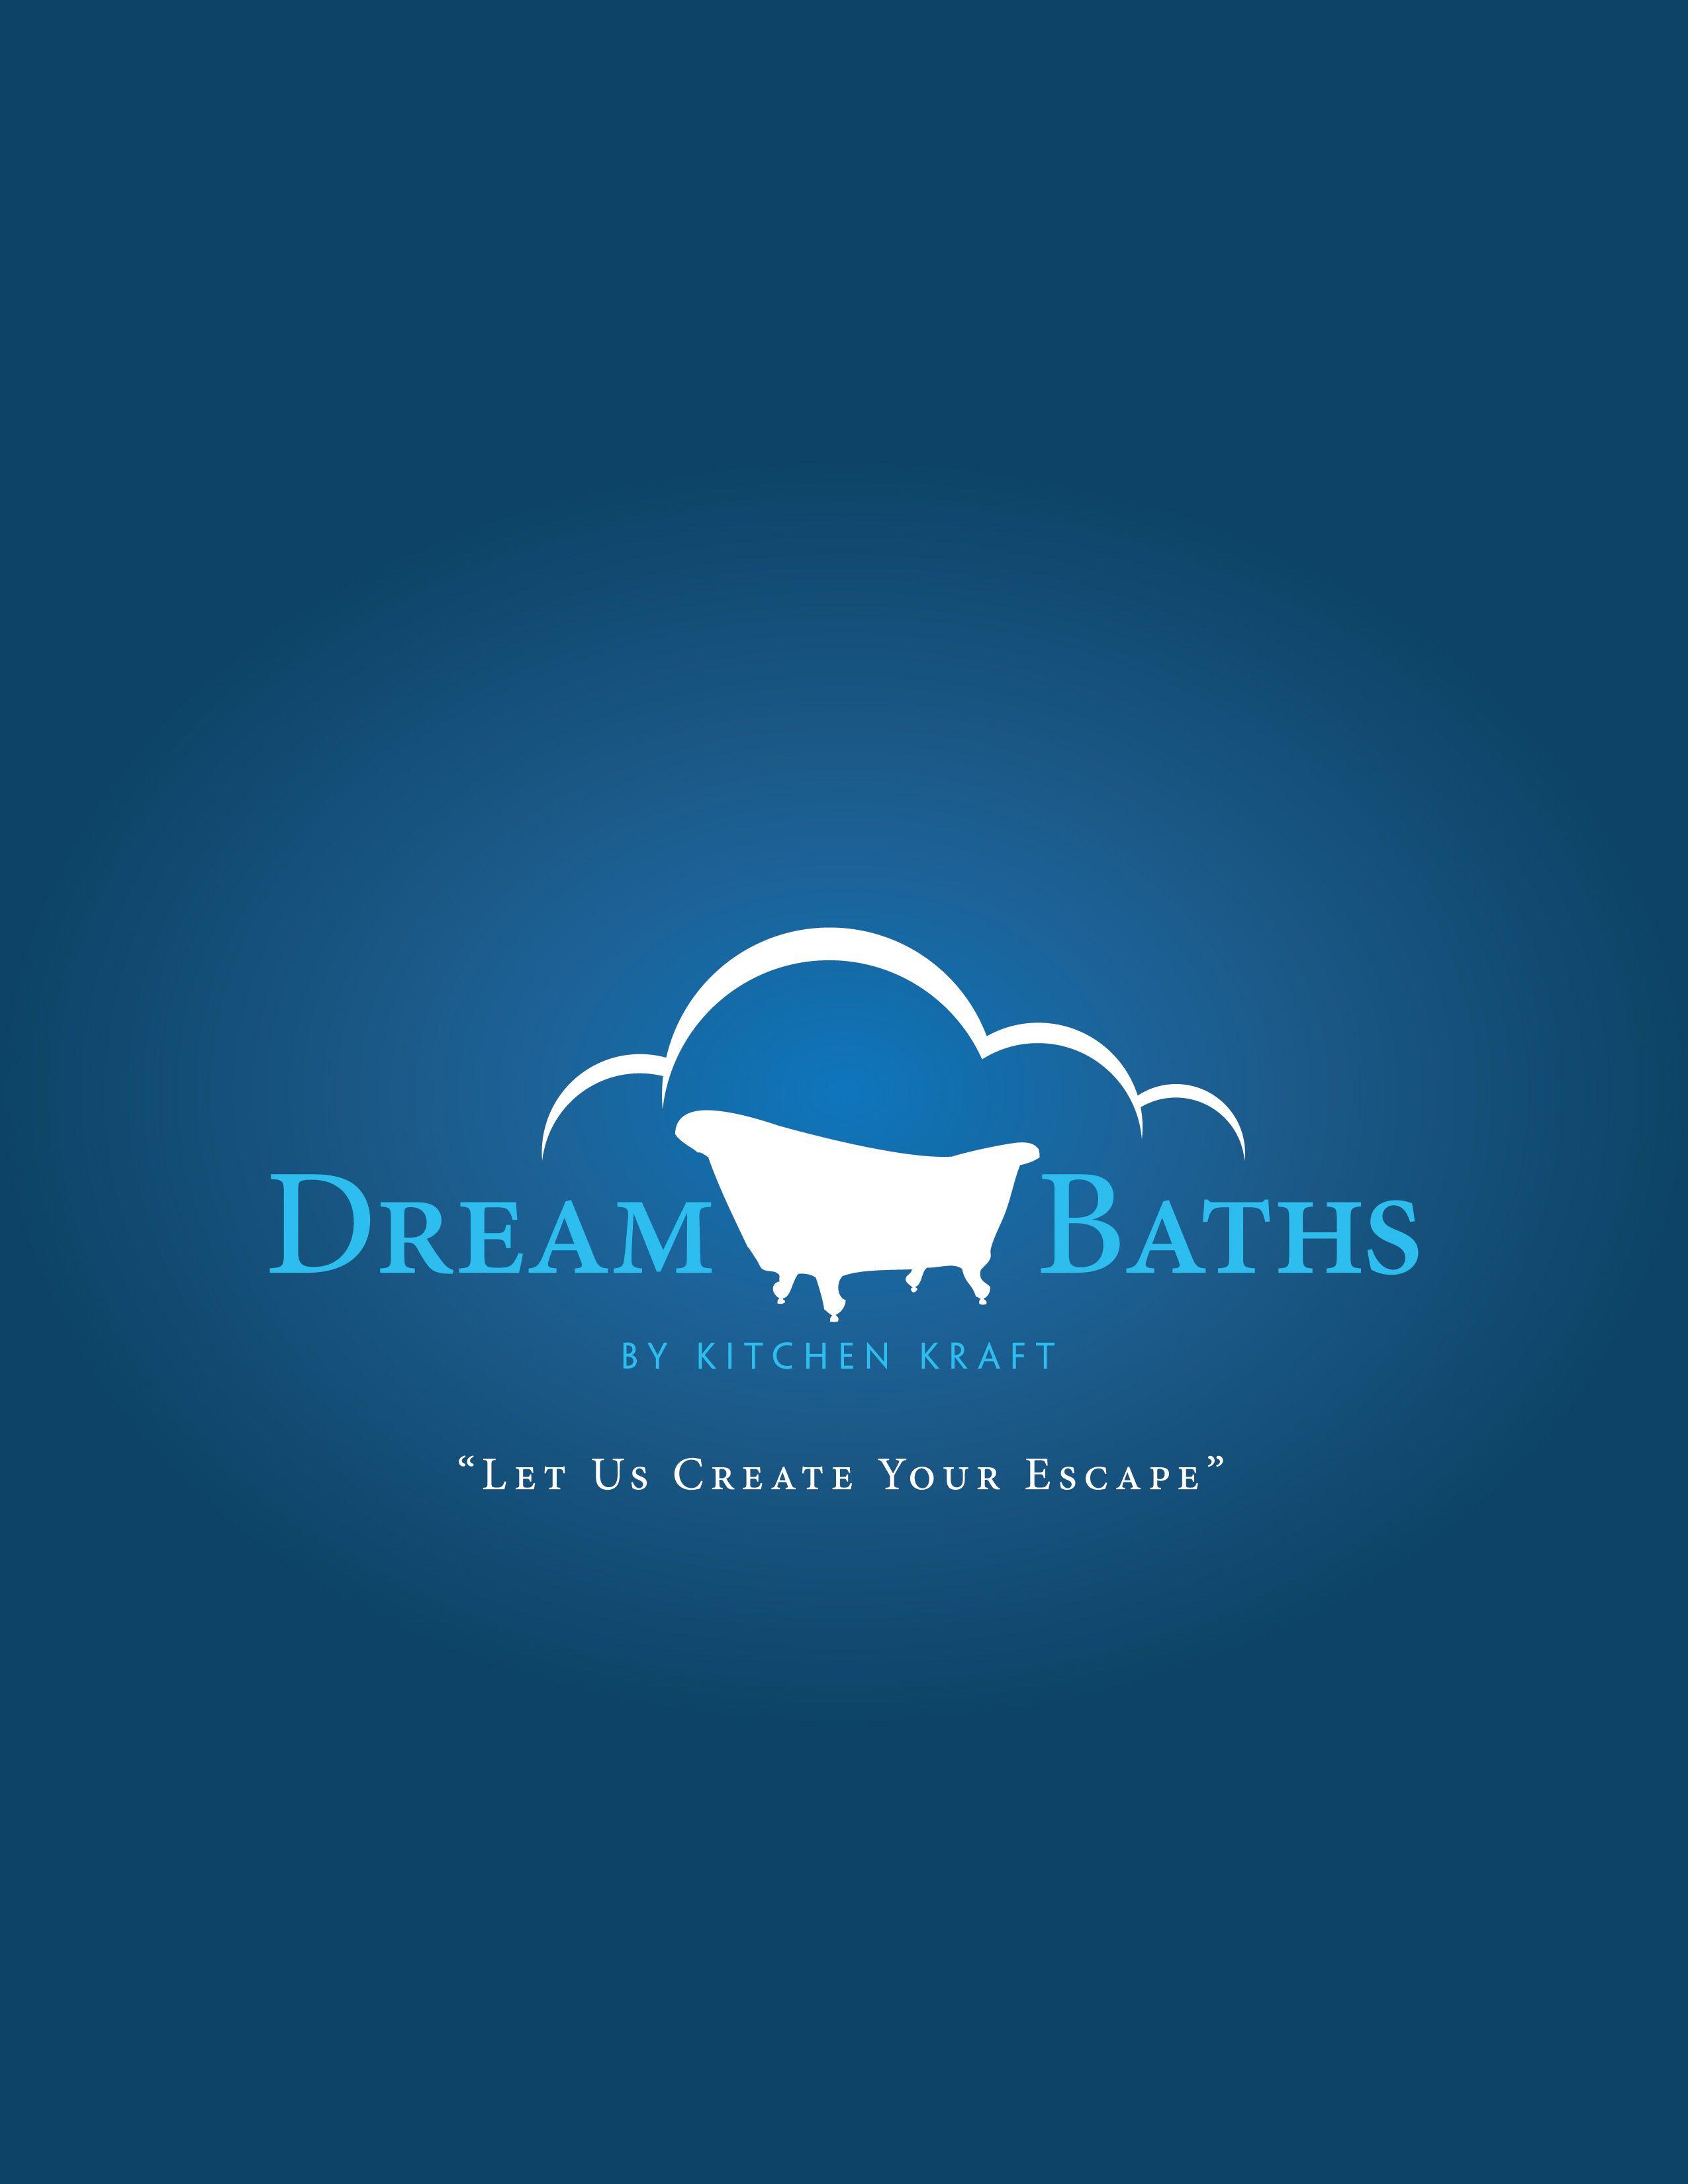 Bathroom logos ideas - Kitchen And Bath Logo Http Www Kittencarcare Info Kitchen